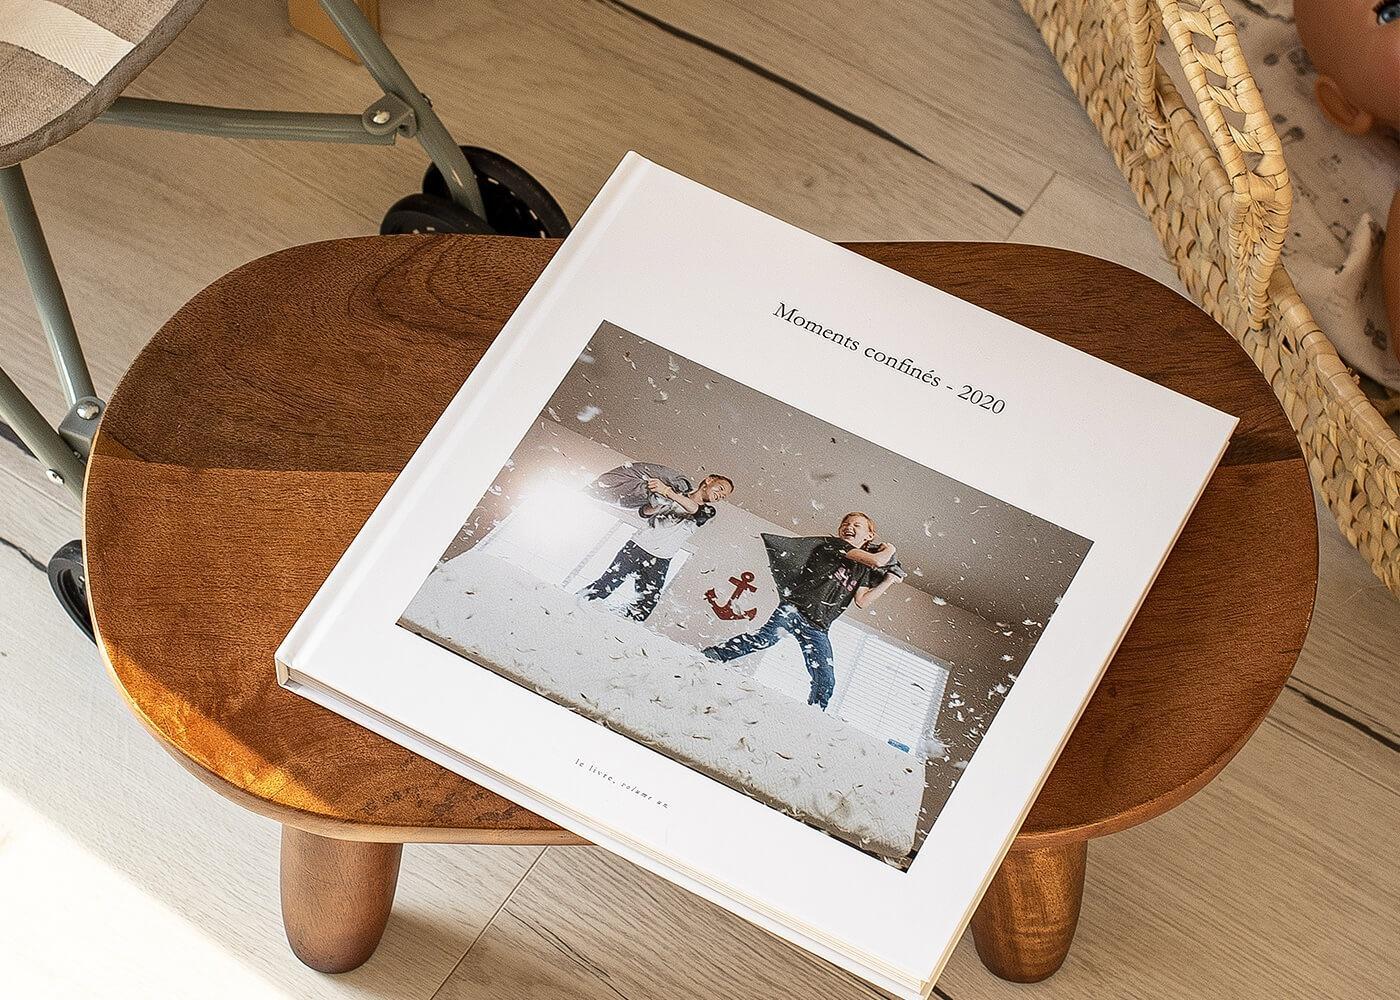 Innocence - Impression - Album photo - Cadeau parfait - Edition